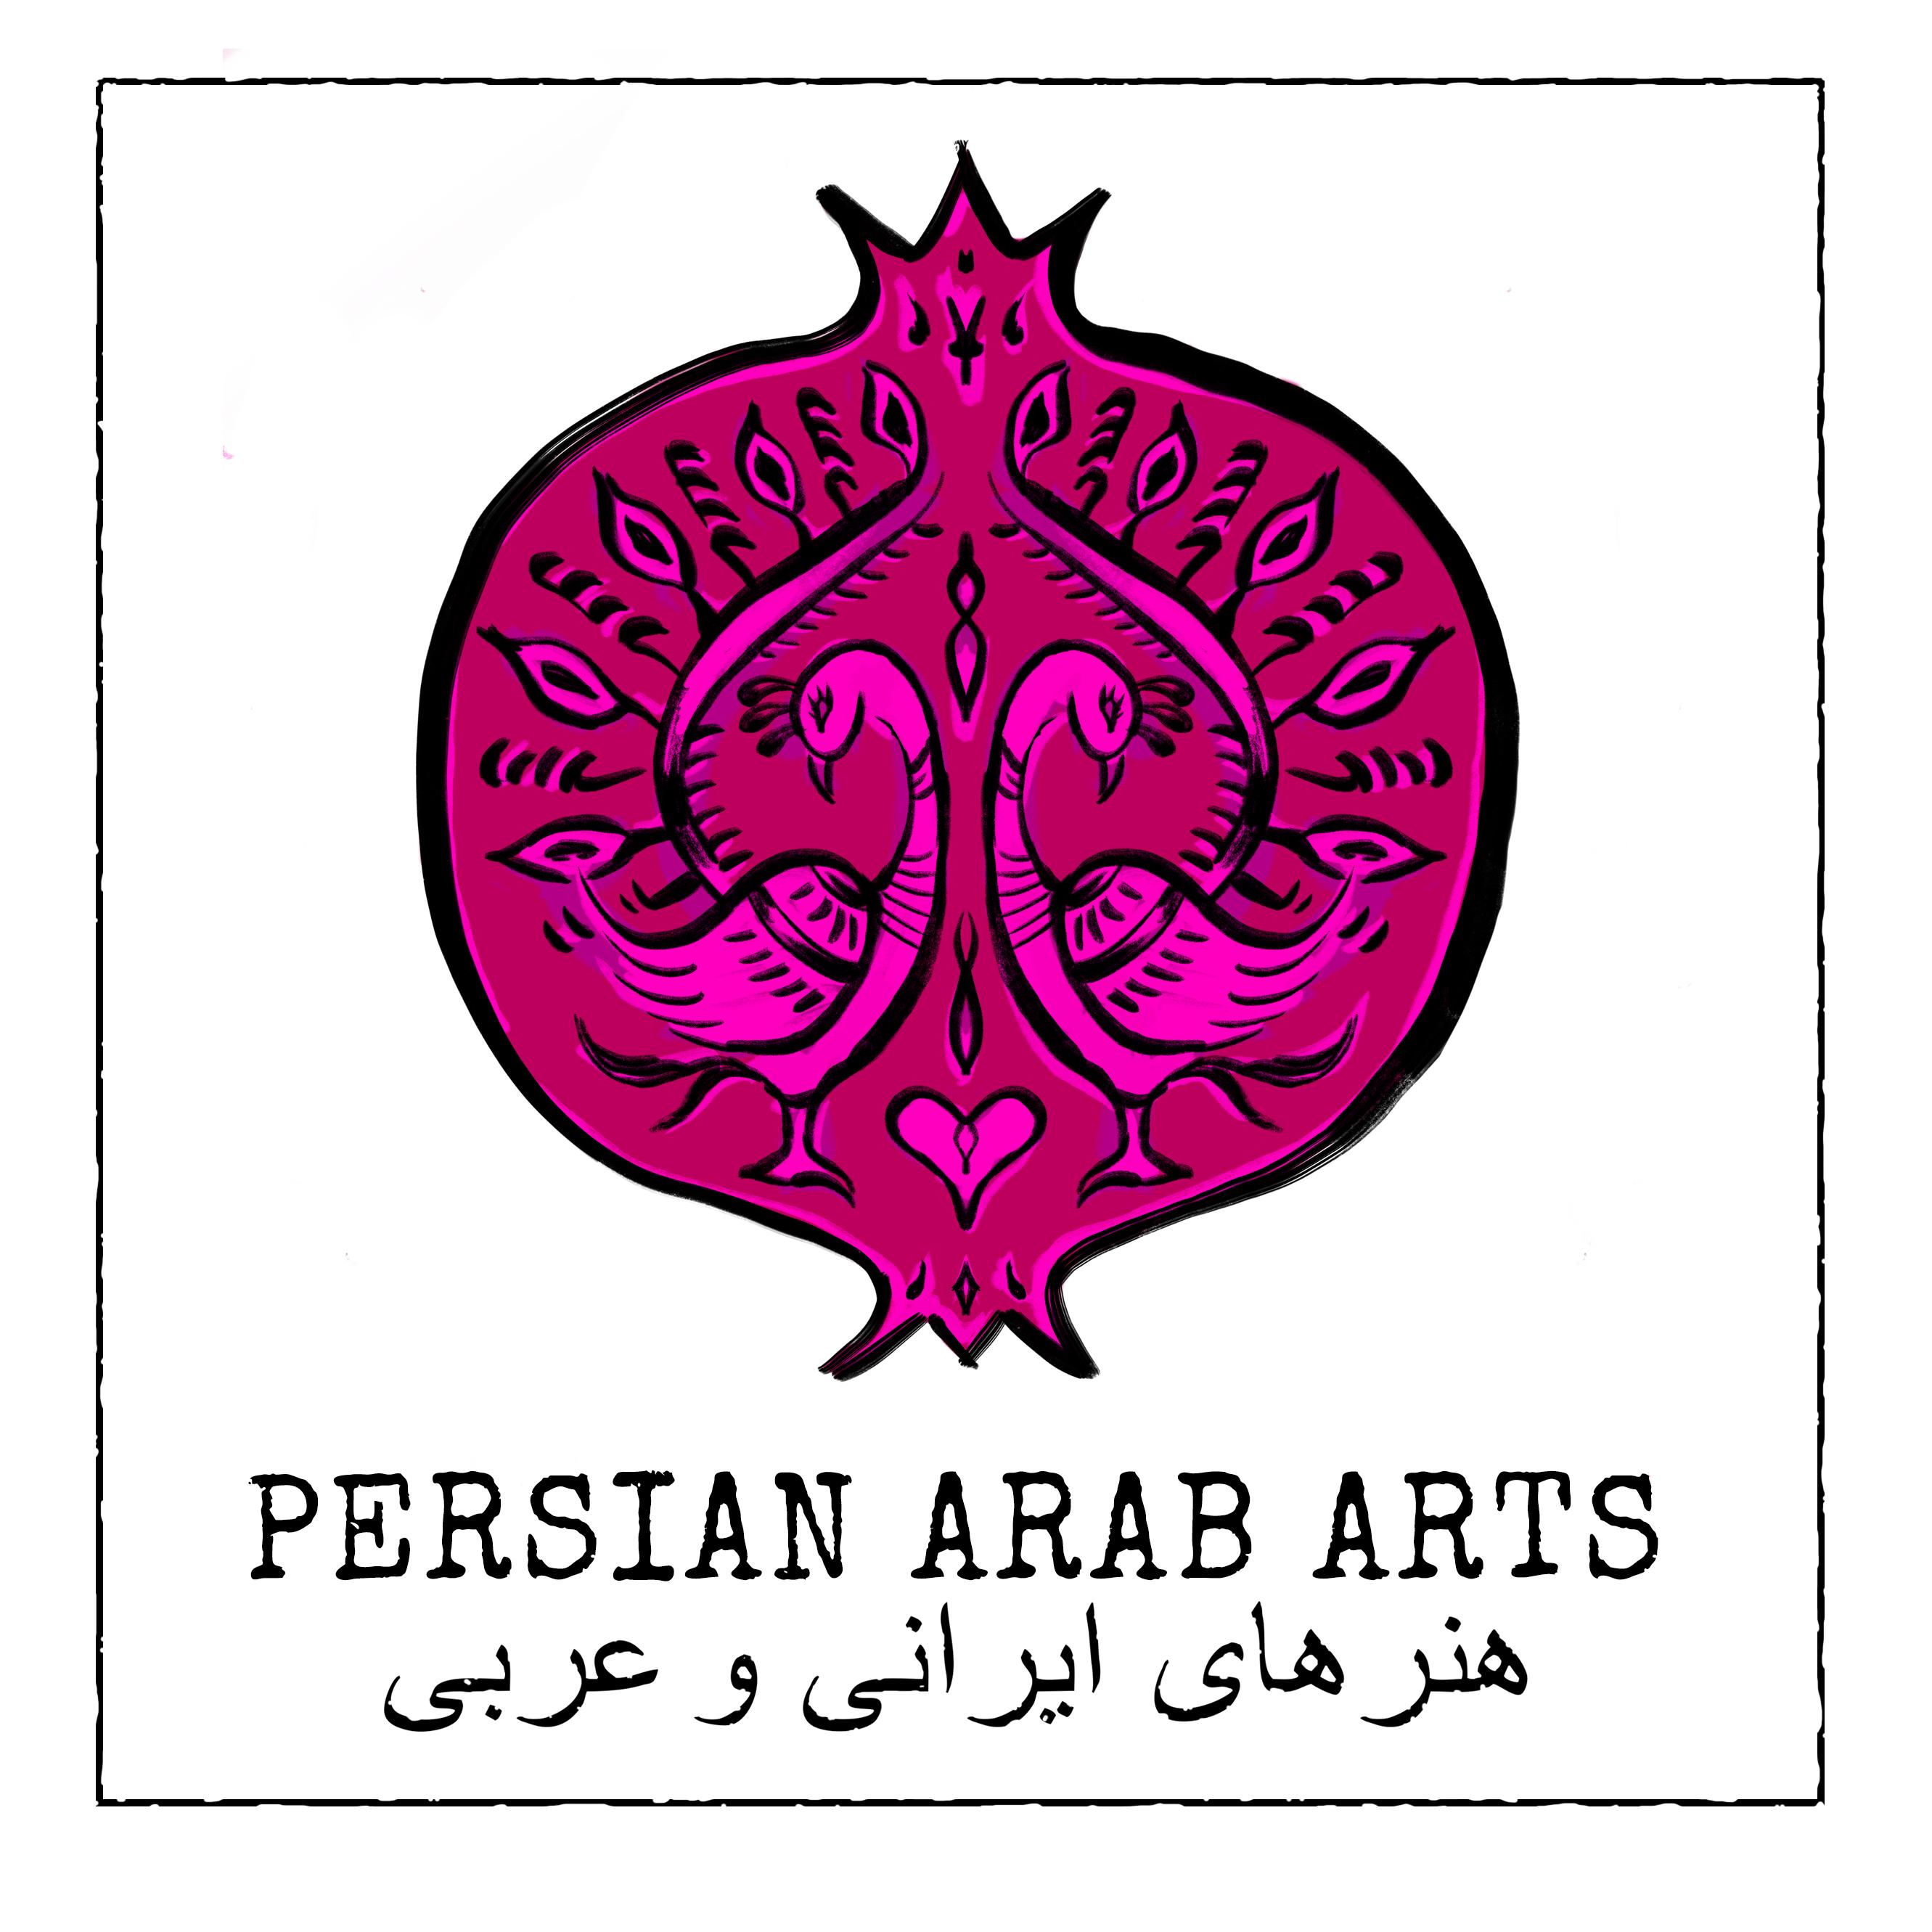 persianArabArts_v02 (2)